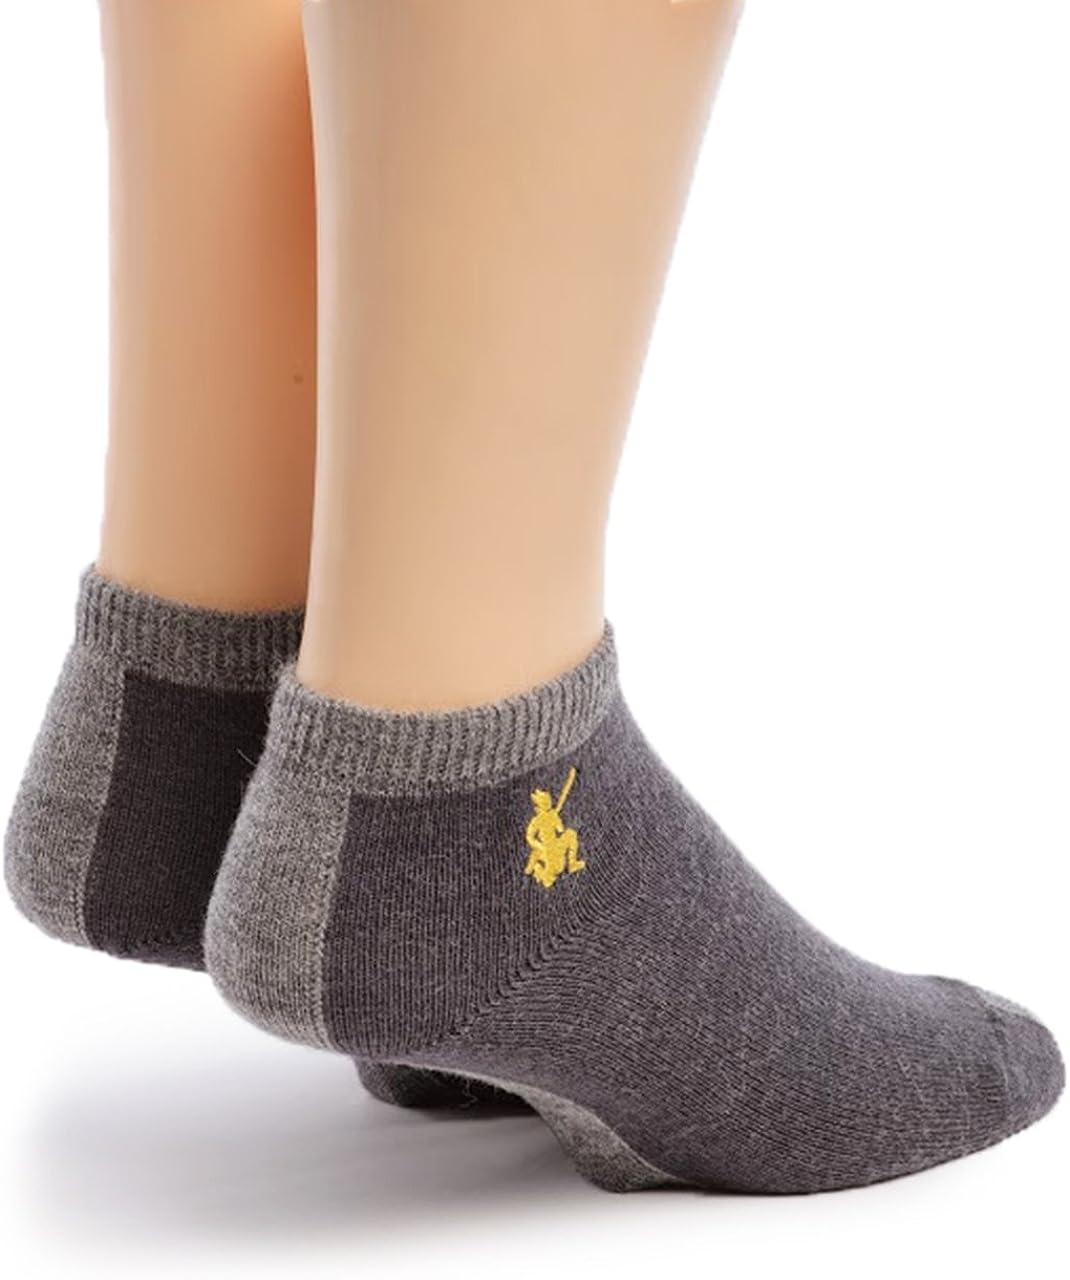 Warrior Alpaca Socks - Unisex Sport Light Mini Crew, Alpaca Wool Socks